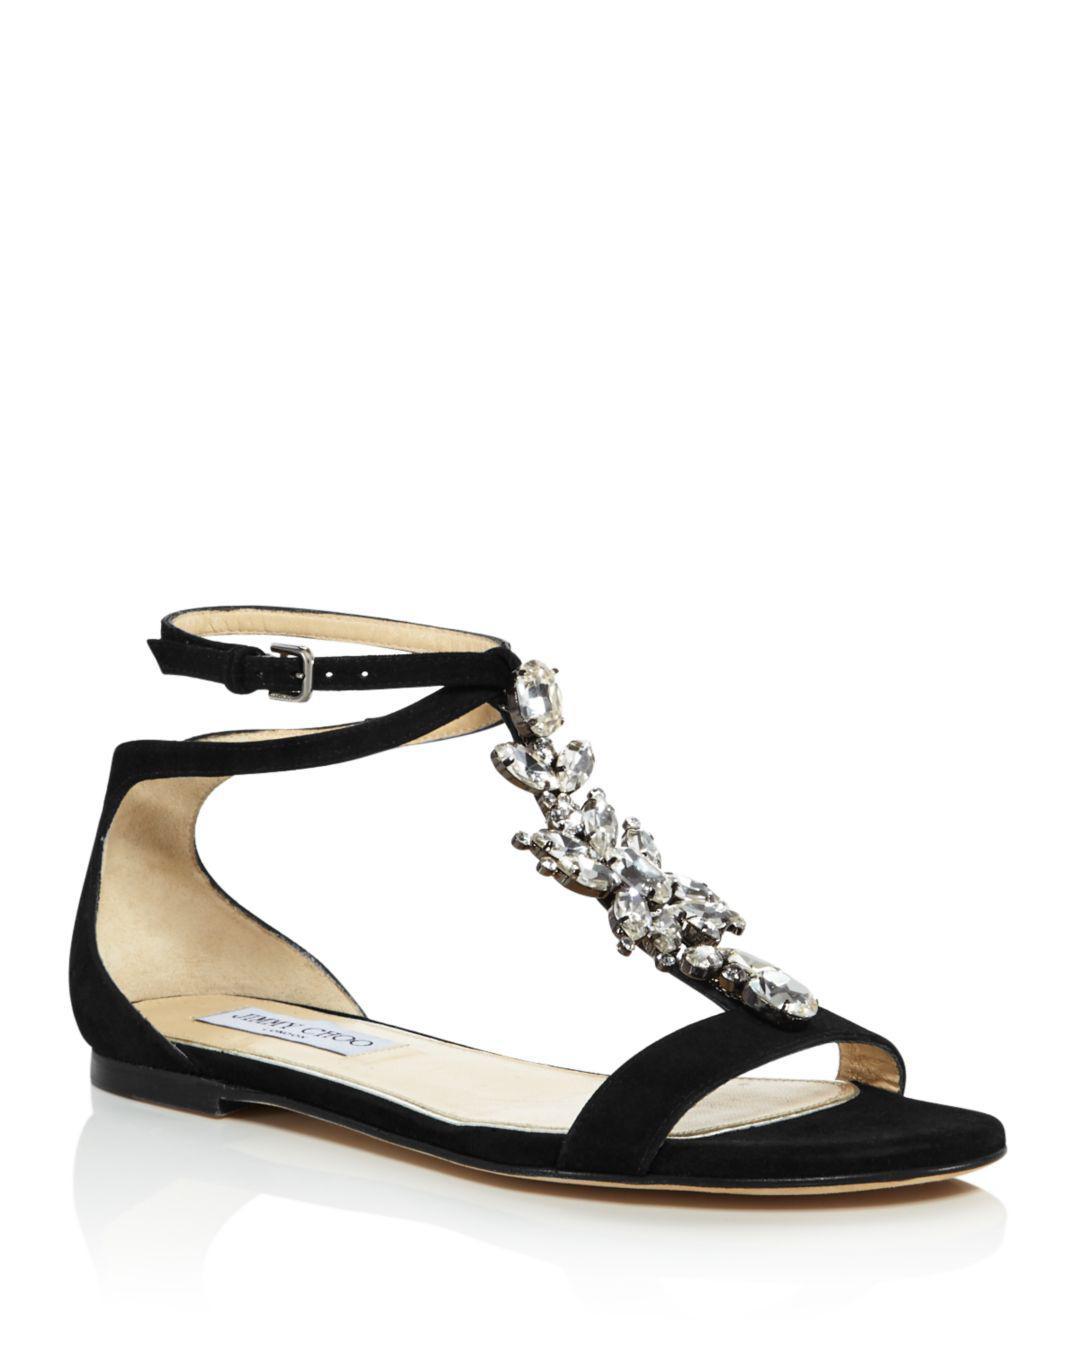 6918c0b457ba Lyst - Jimmy Choo Women s Averie Embellished Suede T-strap Sandals ...